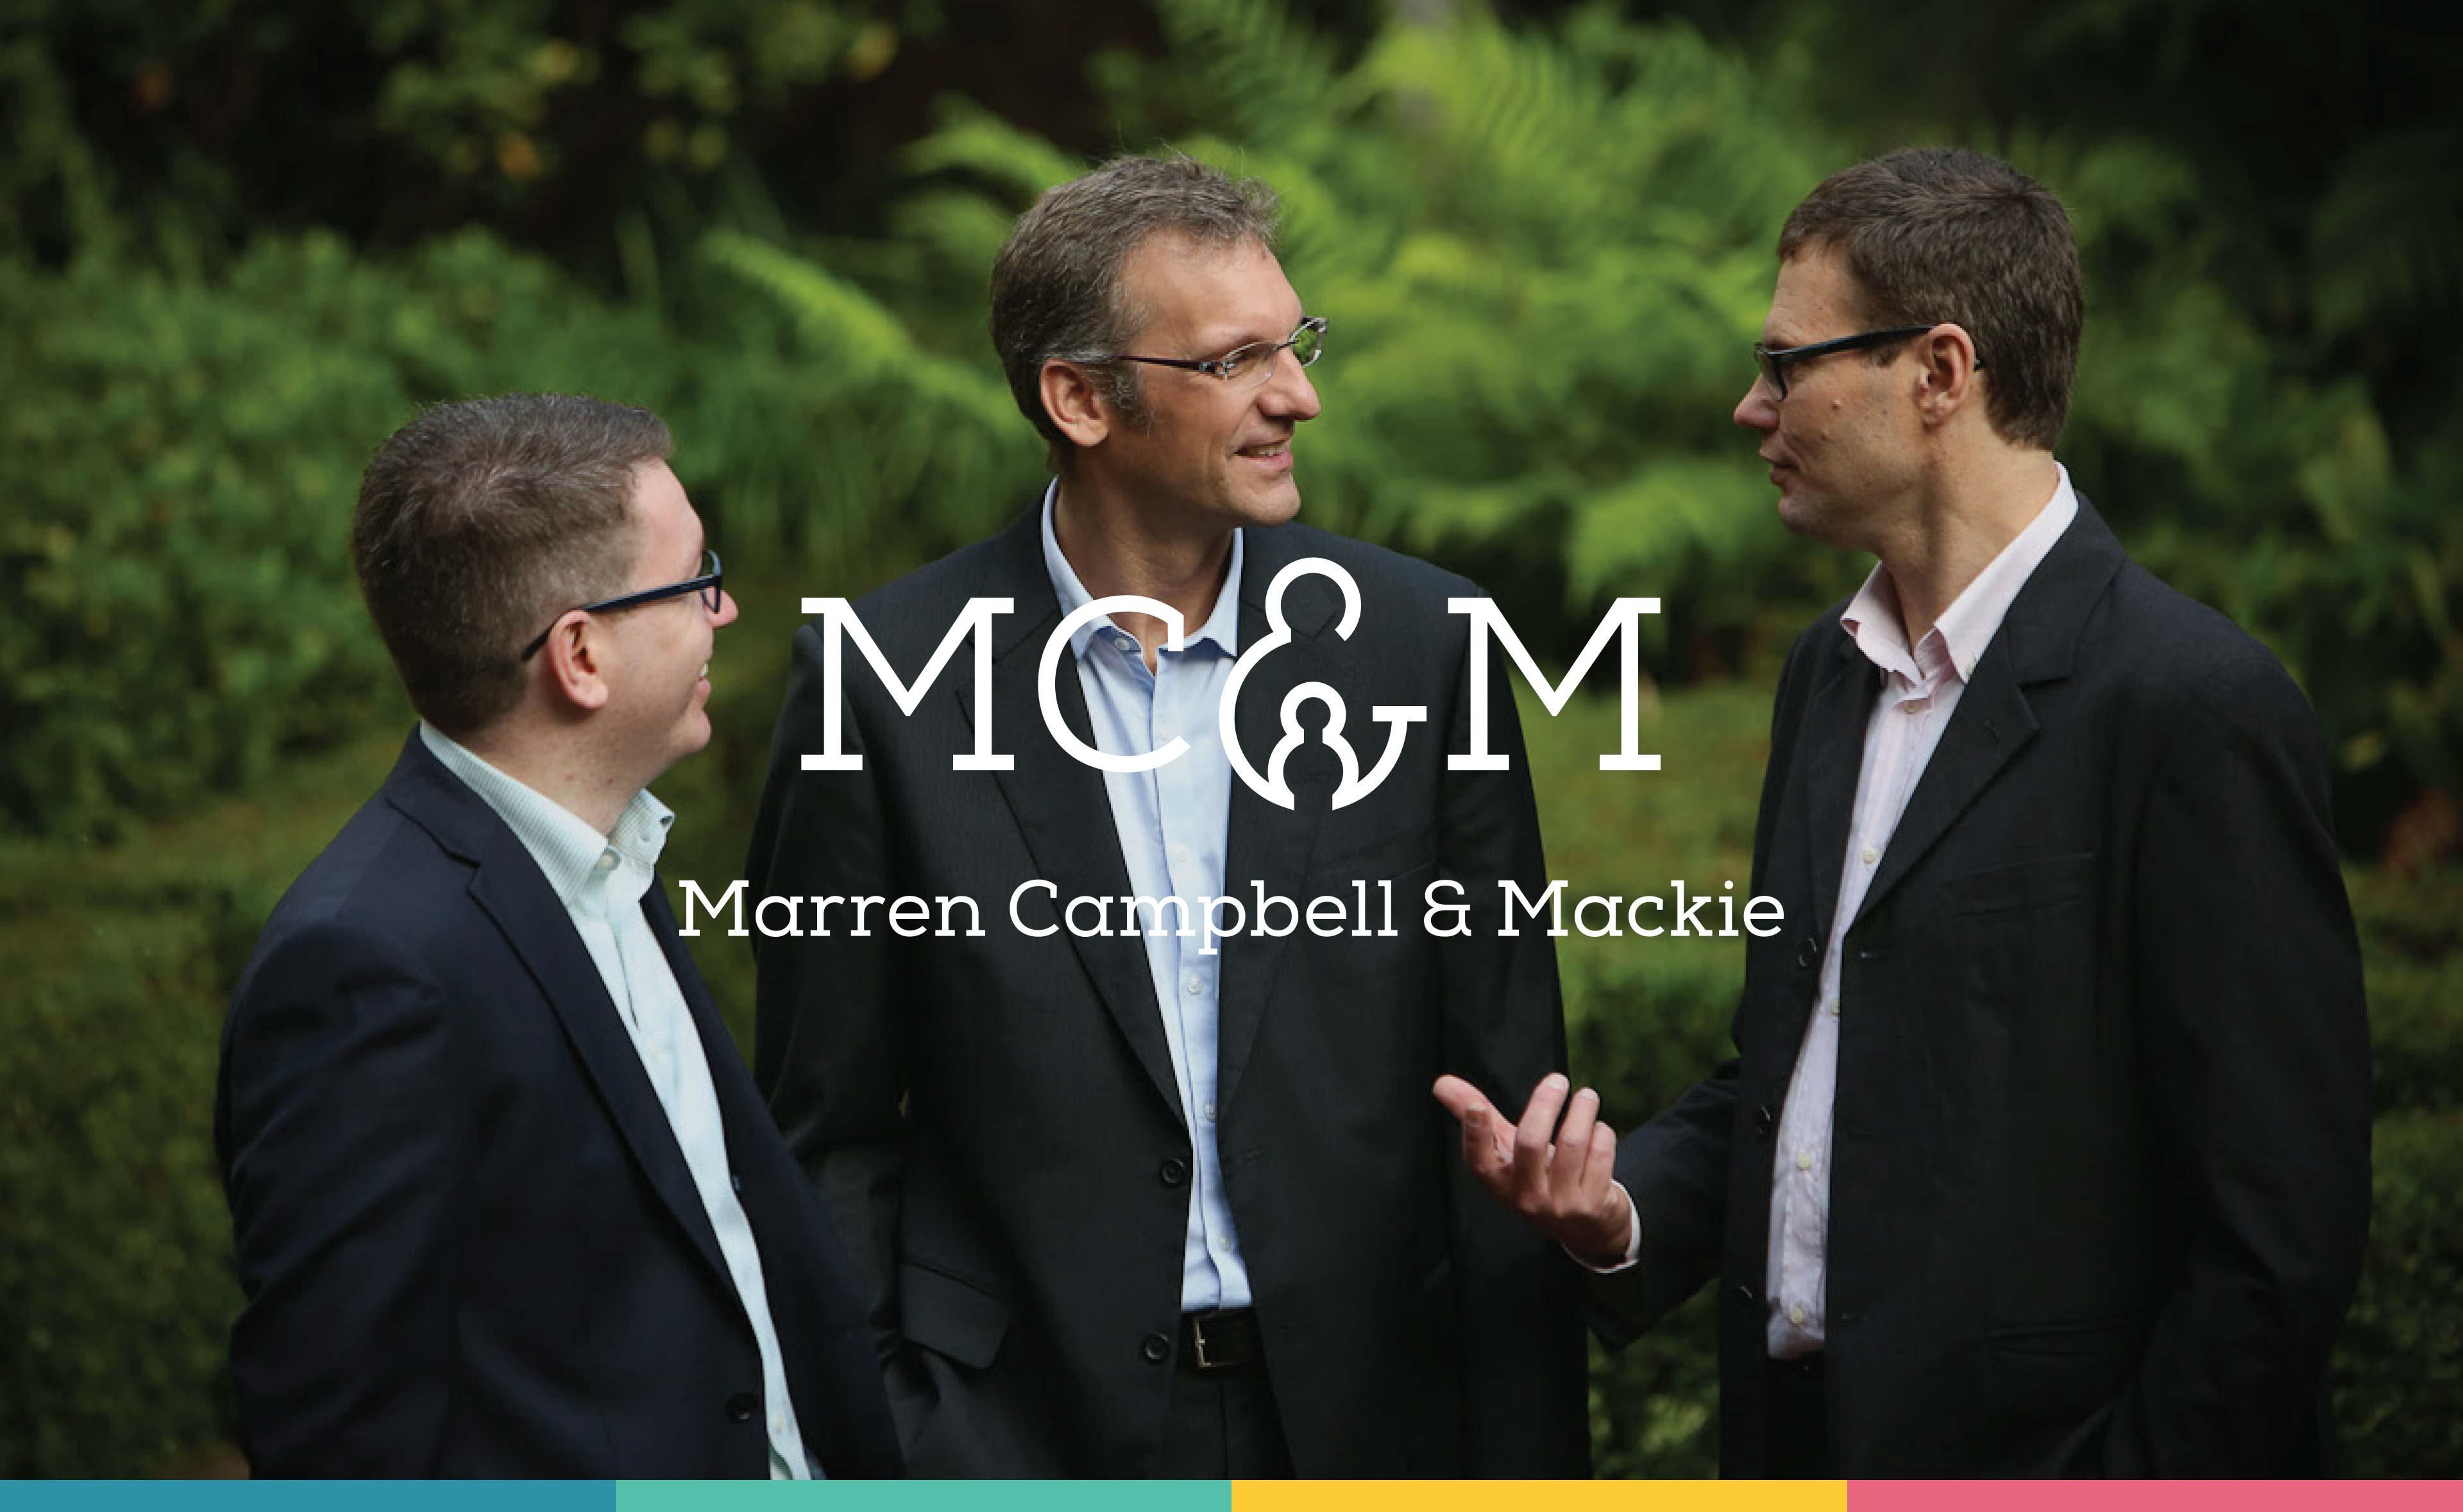 Marren Campbell & Mackie